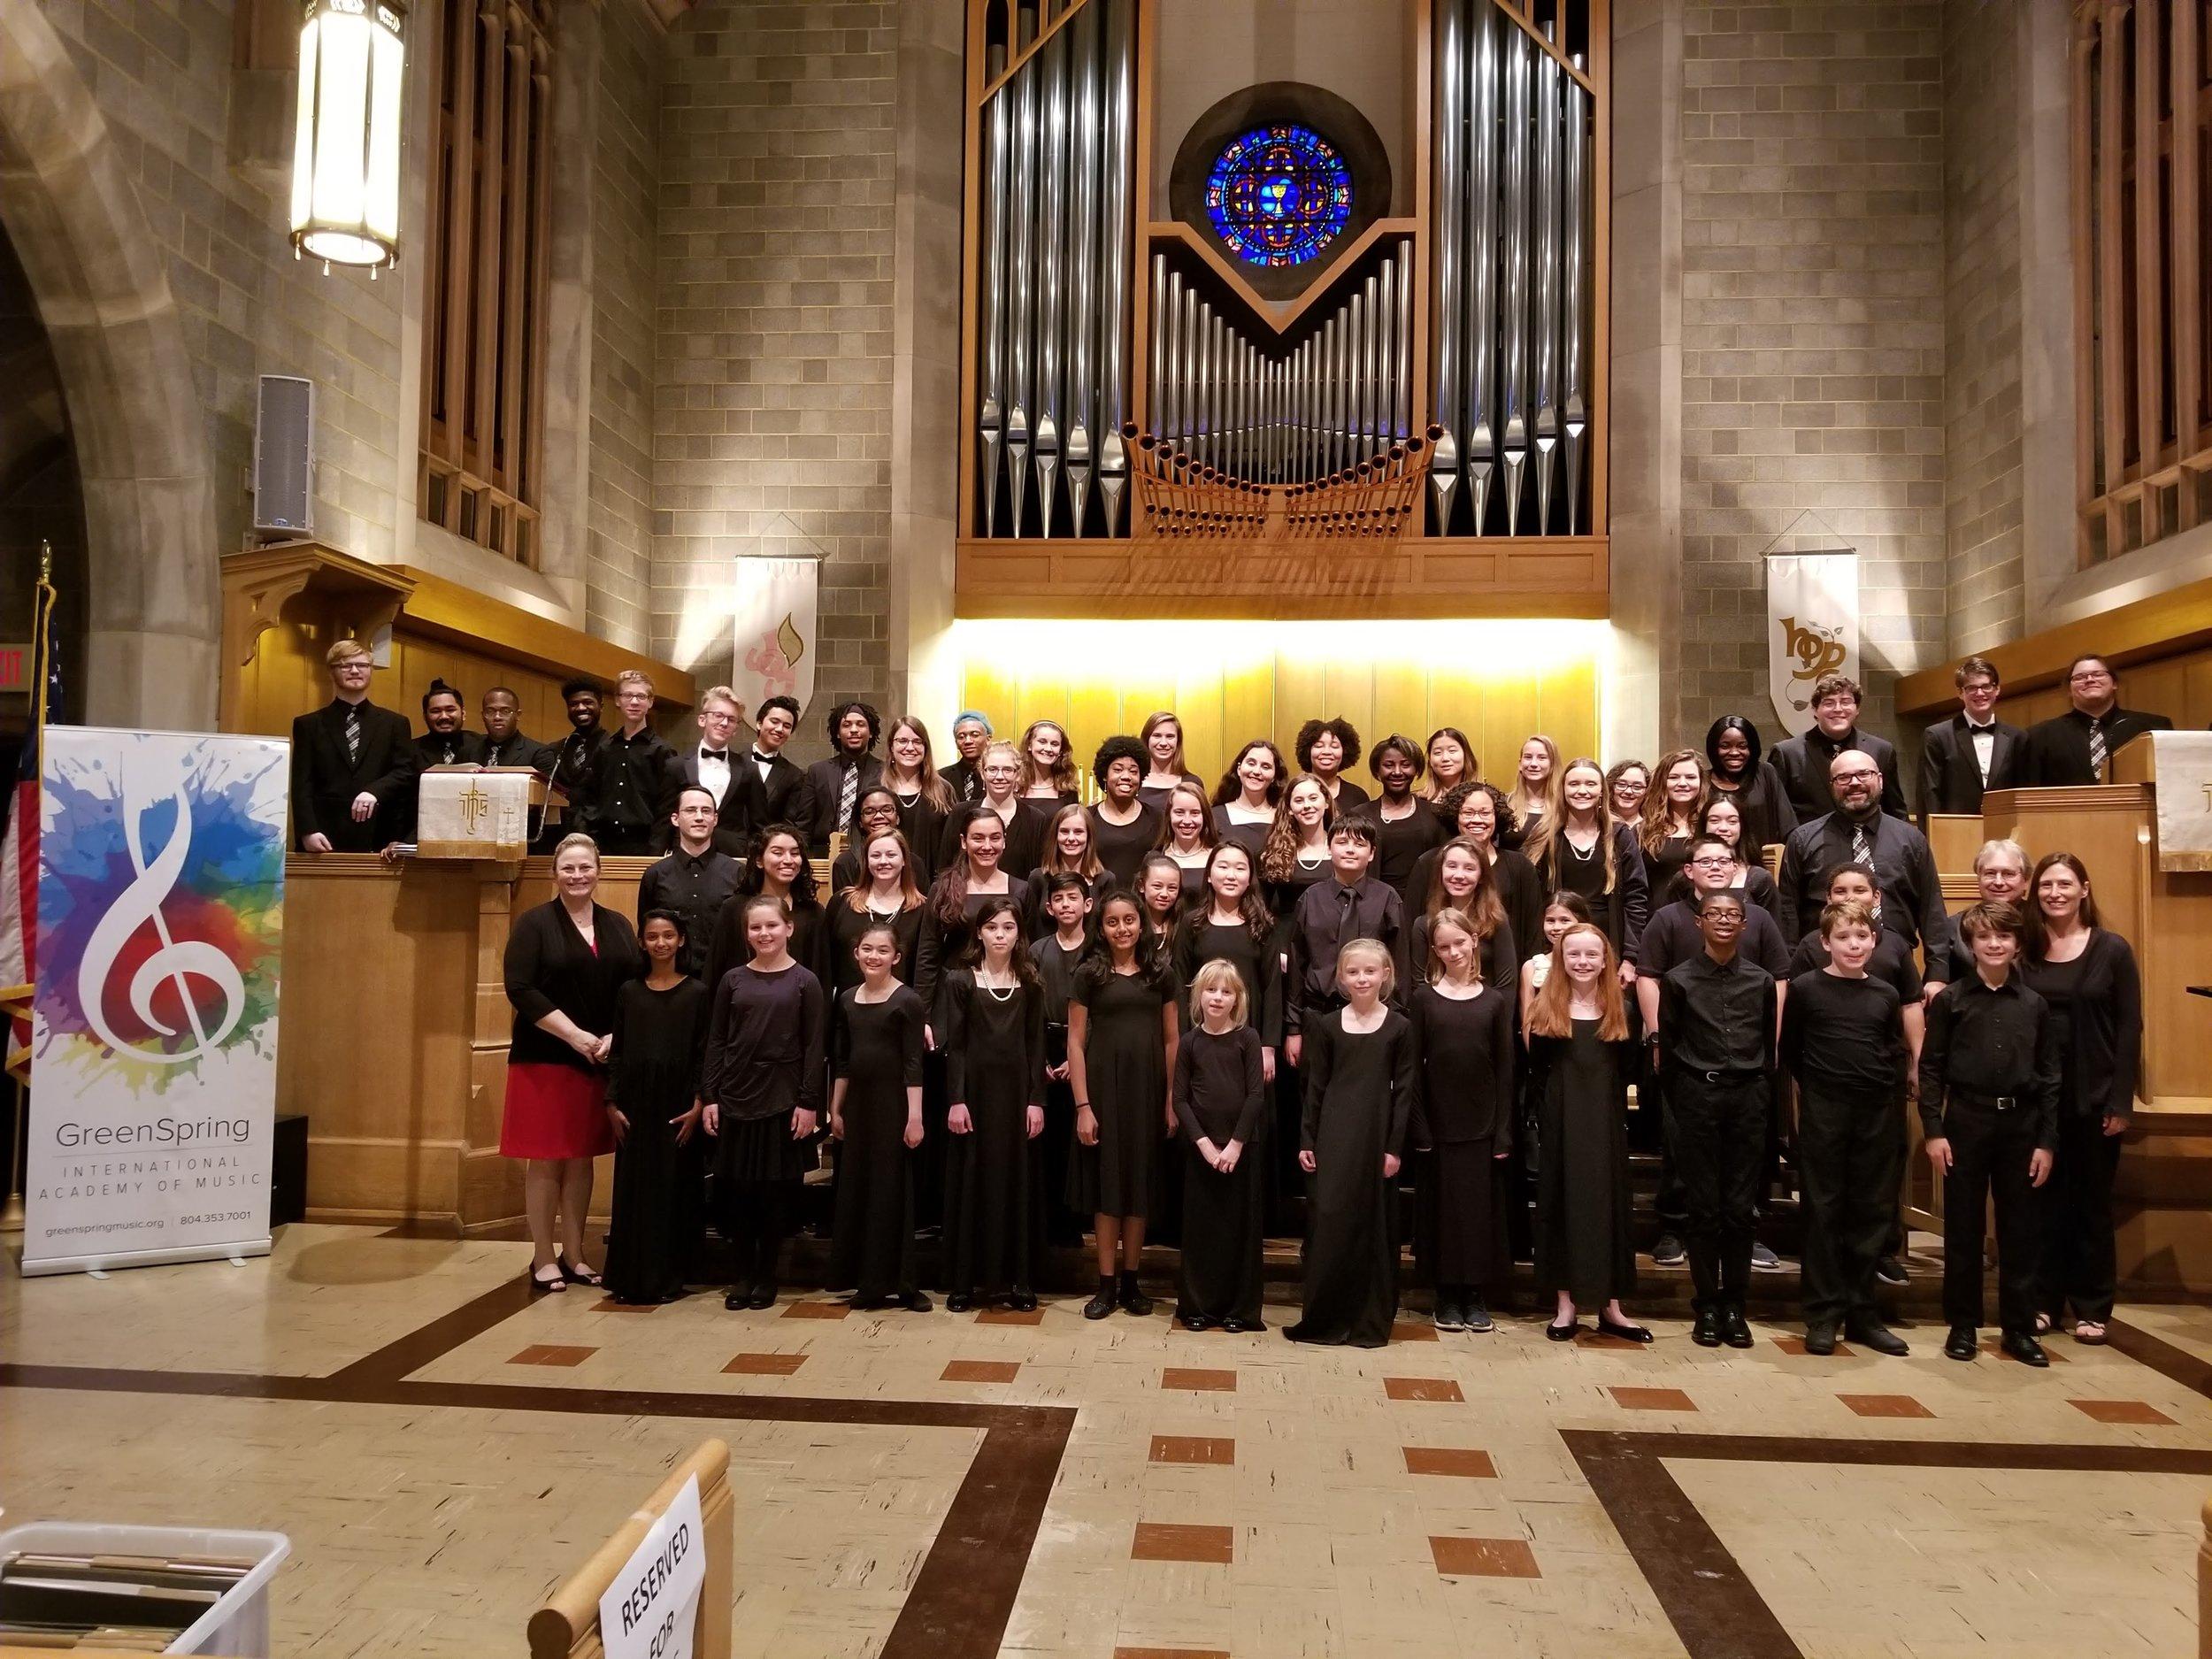 CommUNITY - 2019 Choral Invitational